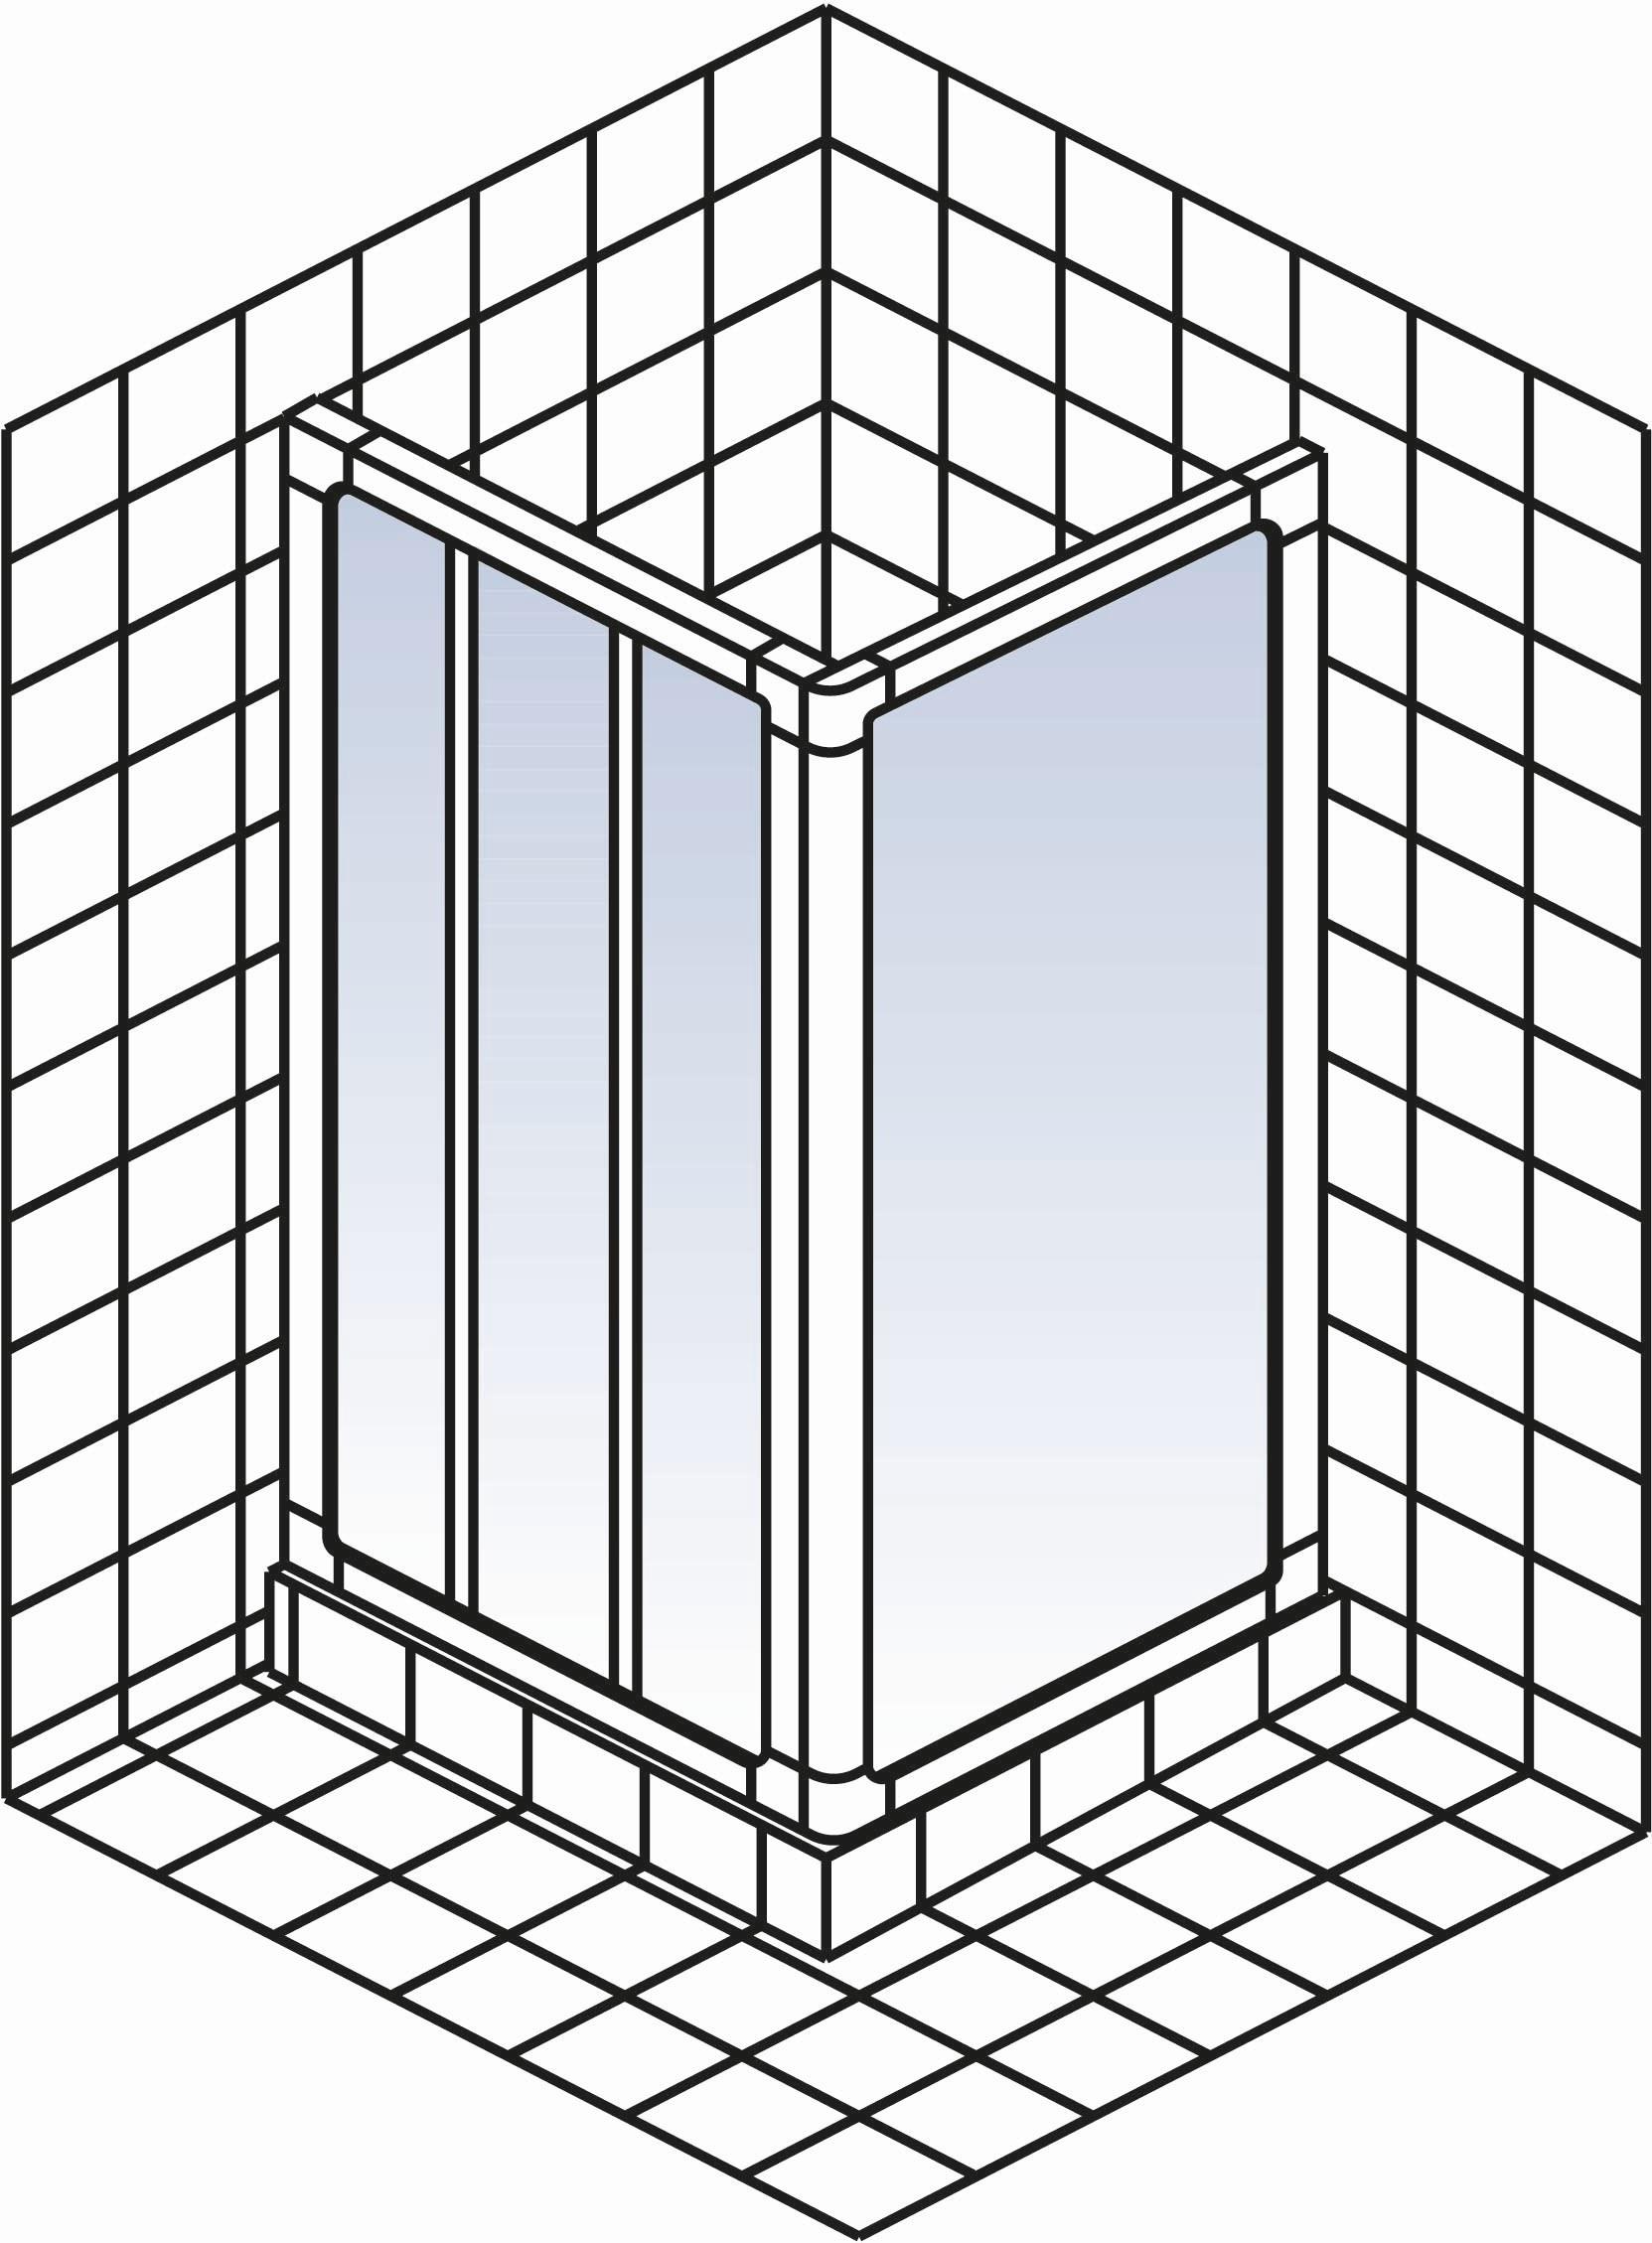 schulte kristall trend gleitt r 3 teilig mit seitenwand d10500x d30500x. Black Bedroom Furniture Sets. Home Design Ideas